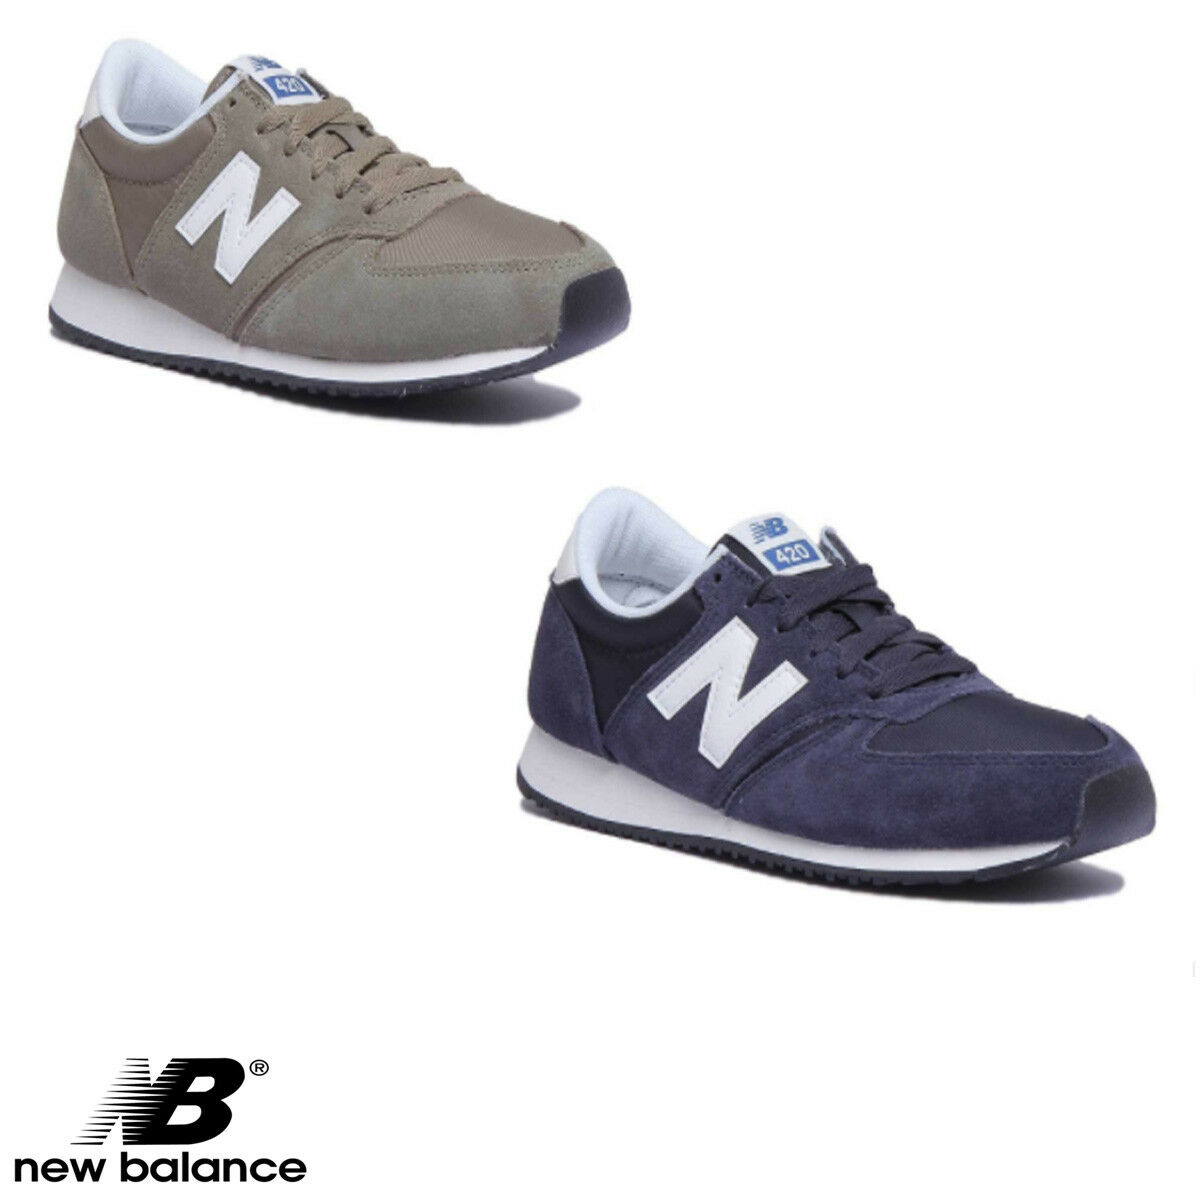 New Balance Trainers U420NVB Men Suede Navy Trainers Balance Größe 7.5 - 13 499800